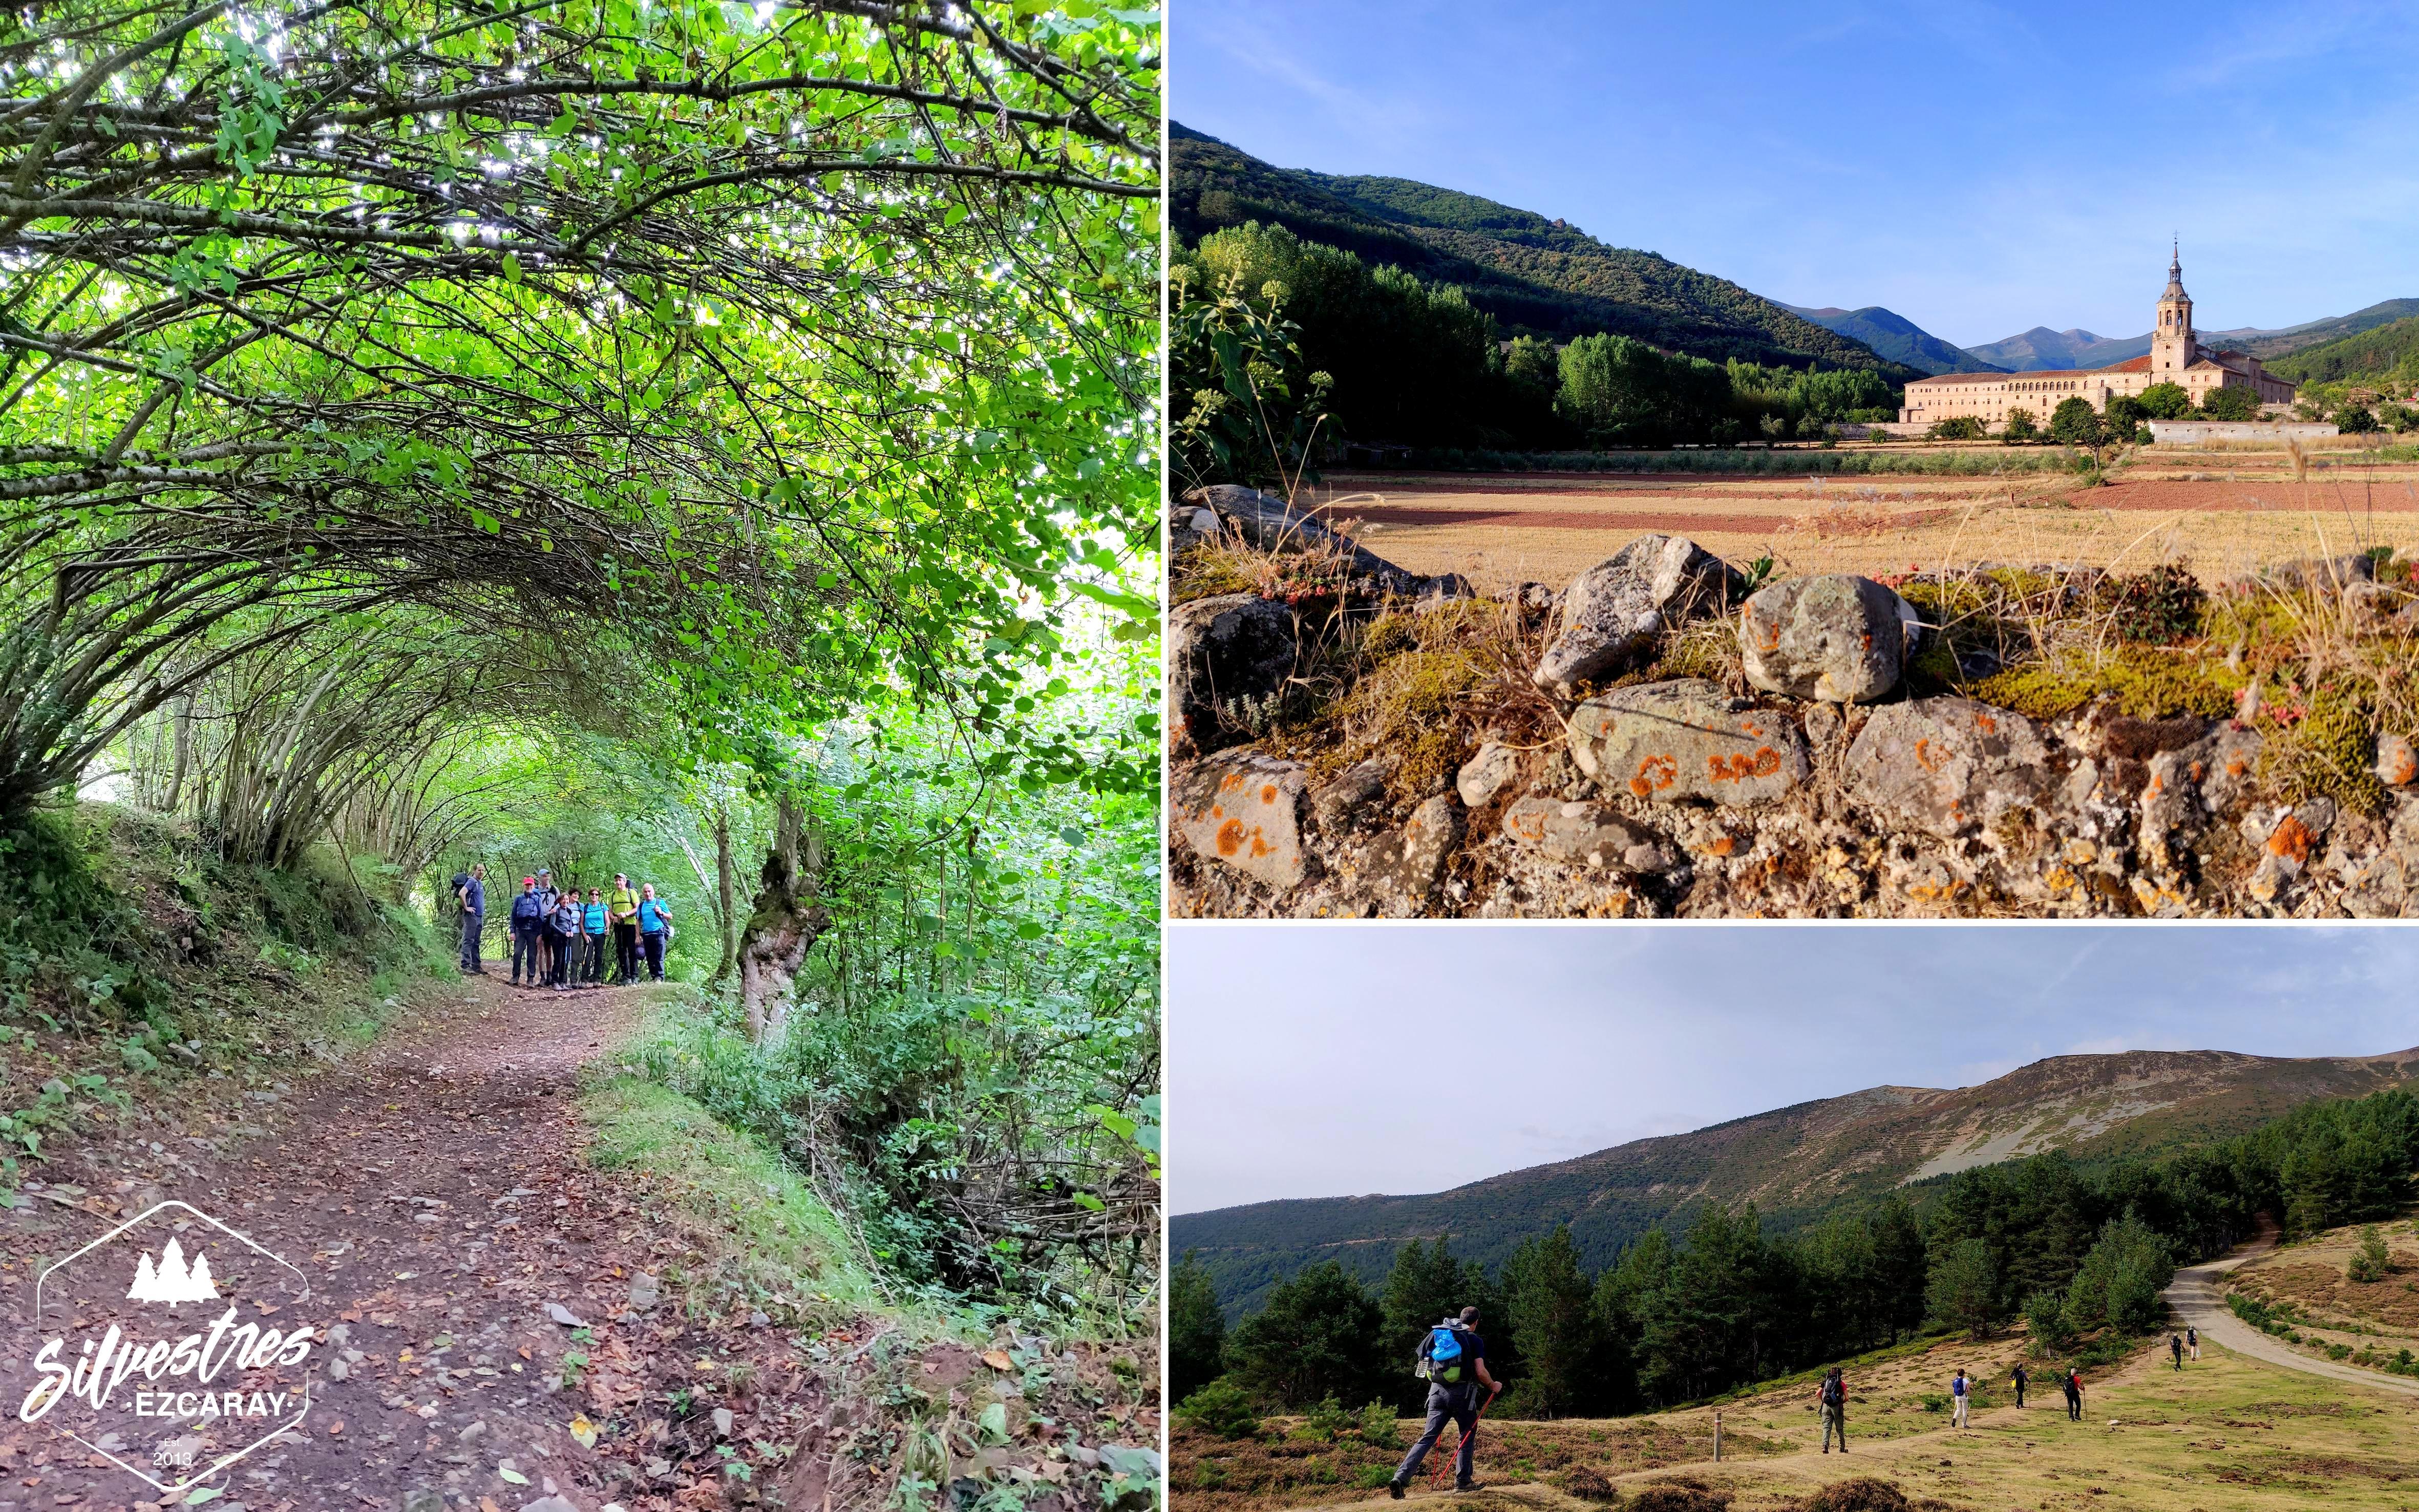 trekking_monasterios_la_rioja_san_millan_cogolla_valvanera_rutas_guia_montaña_empresa